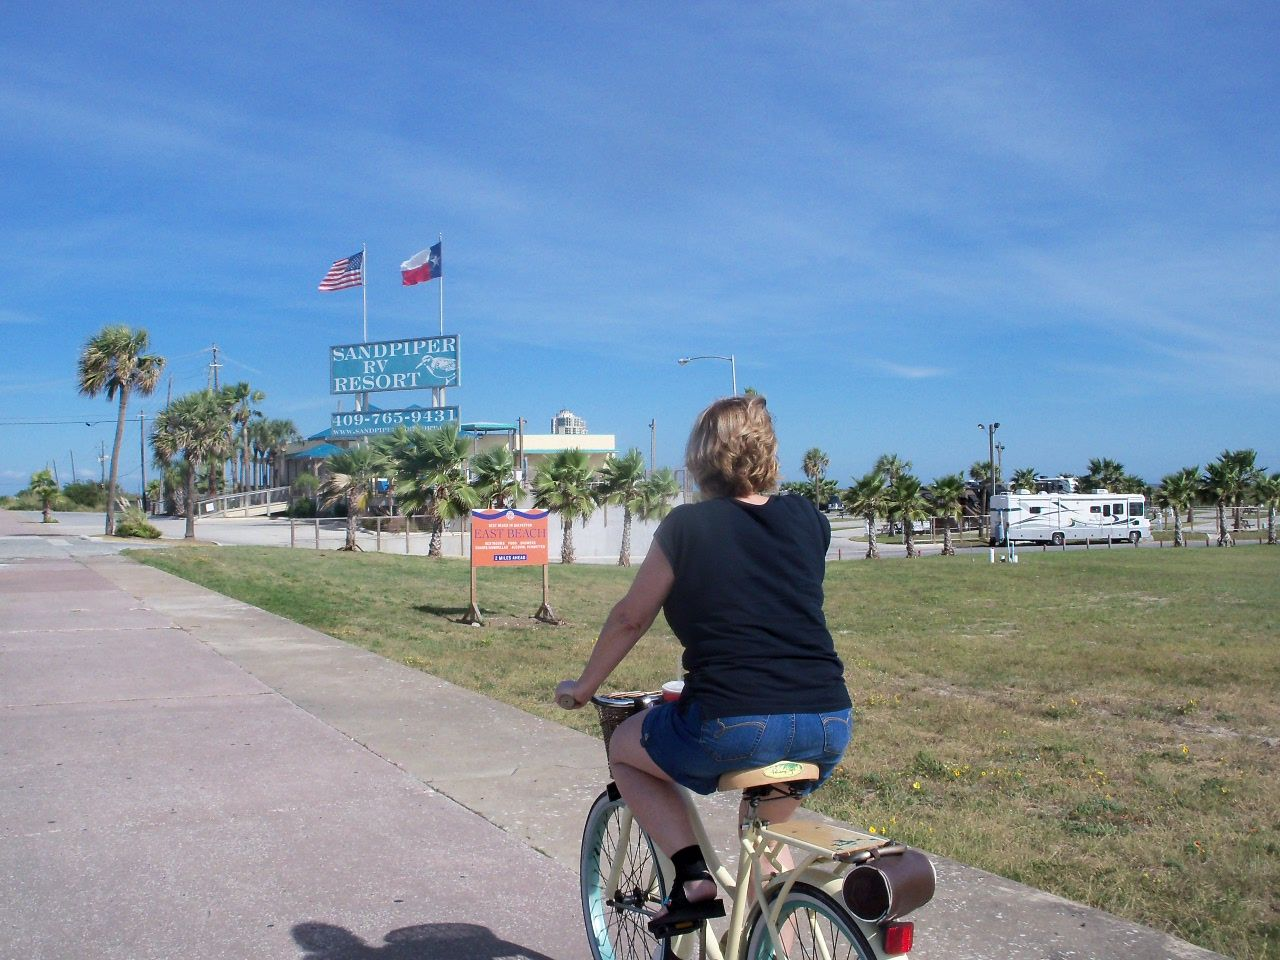 Bike Ride On Seawall Blvd To Sandpiper Rv Resort In Galveston Tx Bike Ride Sea Wall Travel Sites